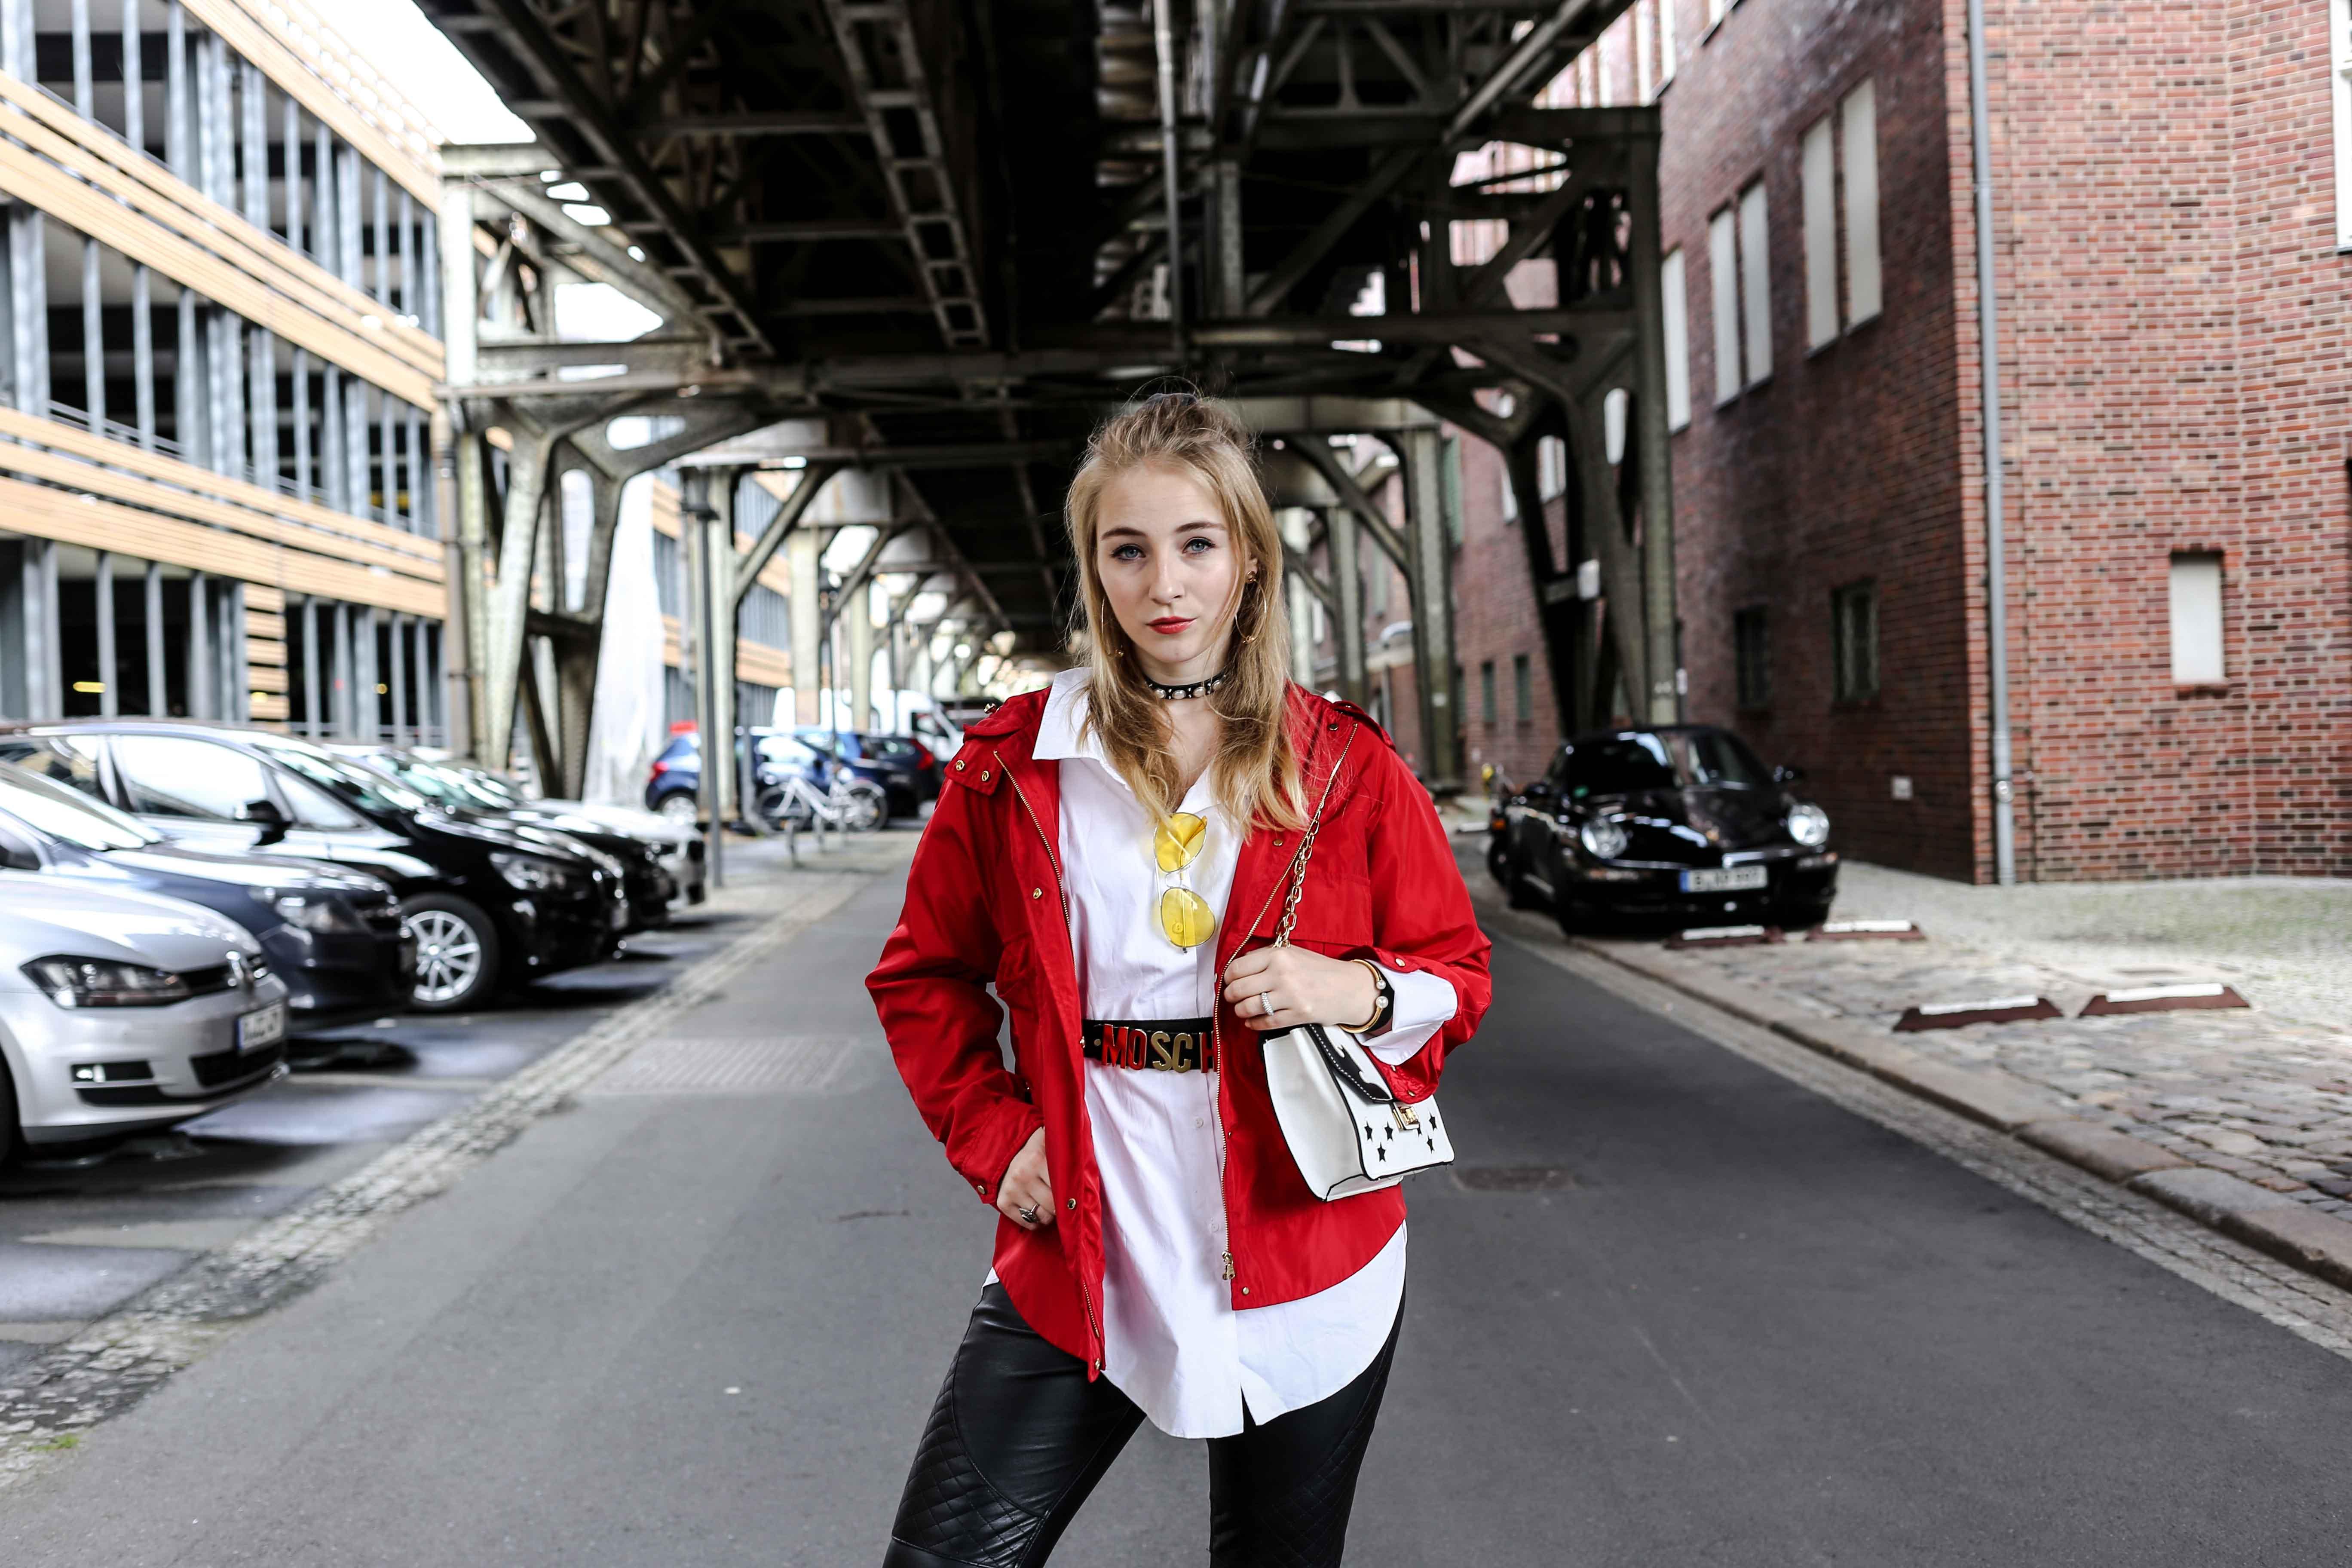 fashion-week-look-rote-regenjacke-grunge-outfit-berlin-modeblog-fashionblog_9332